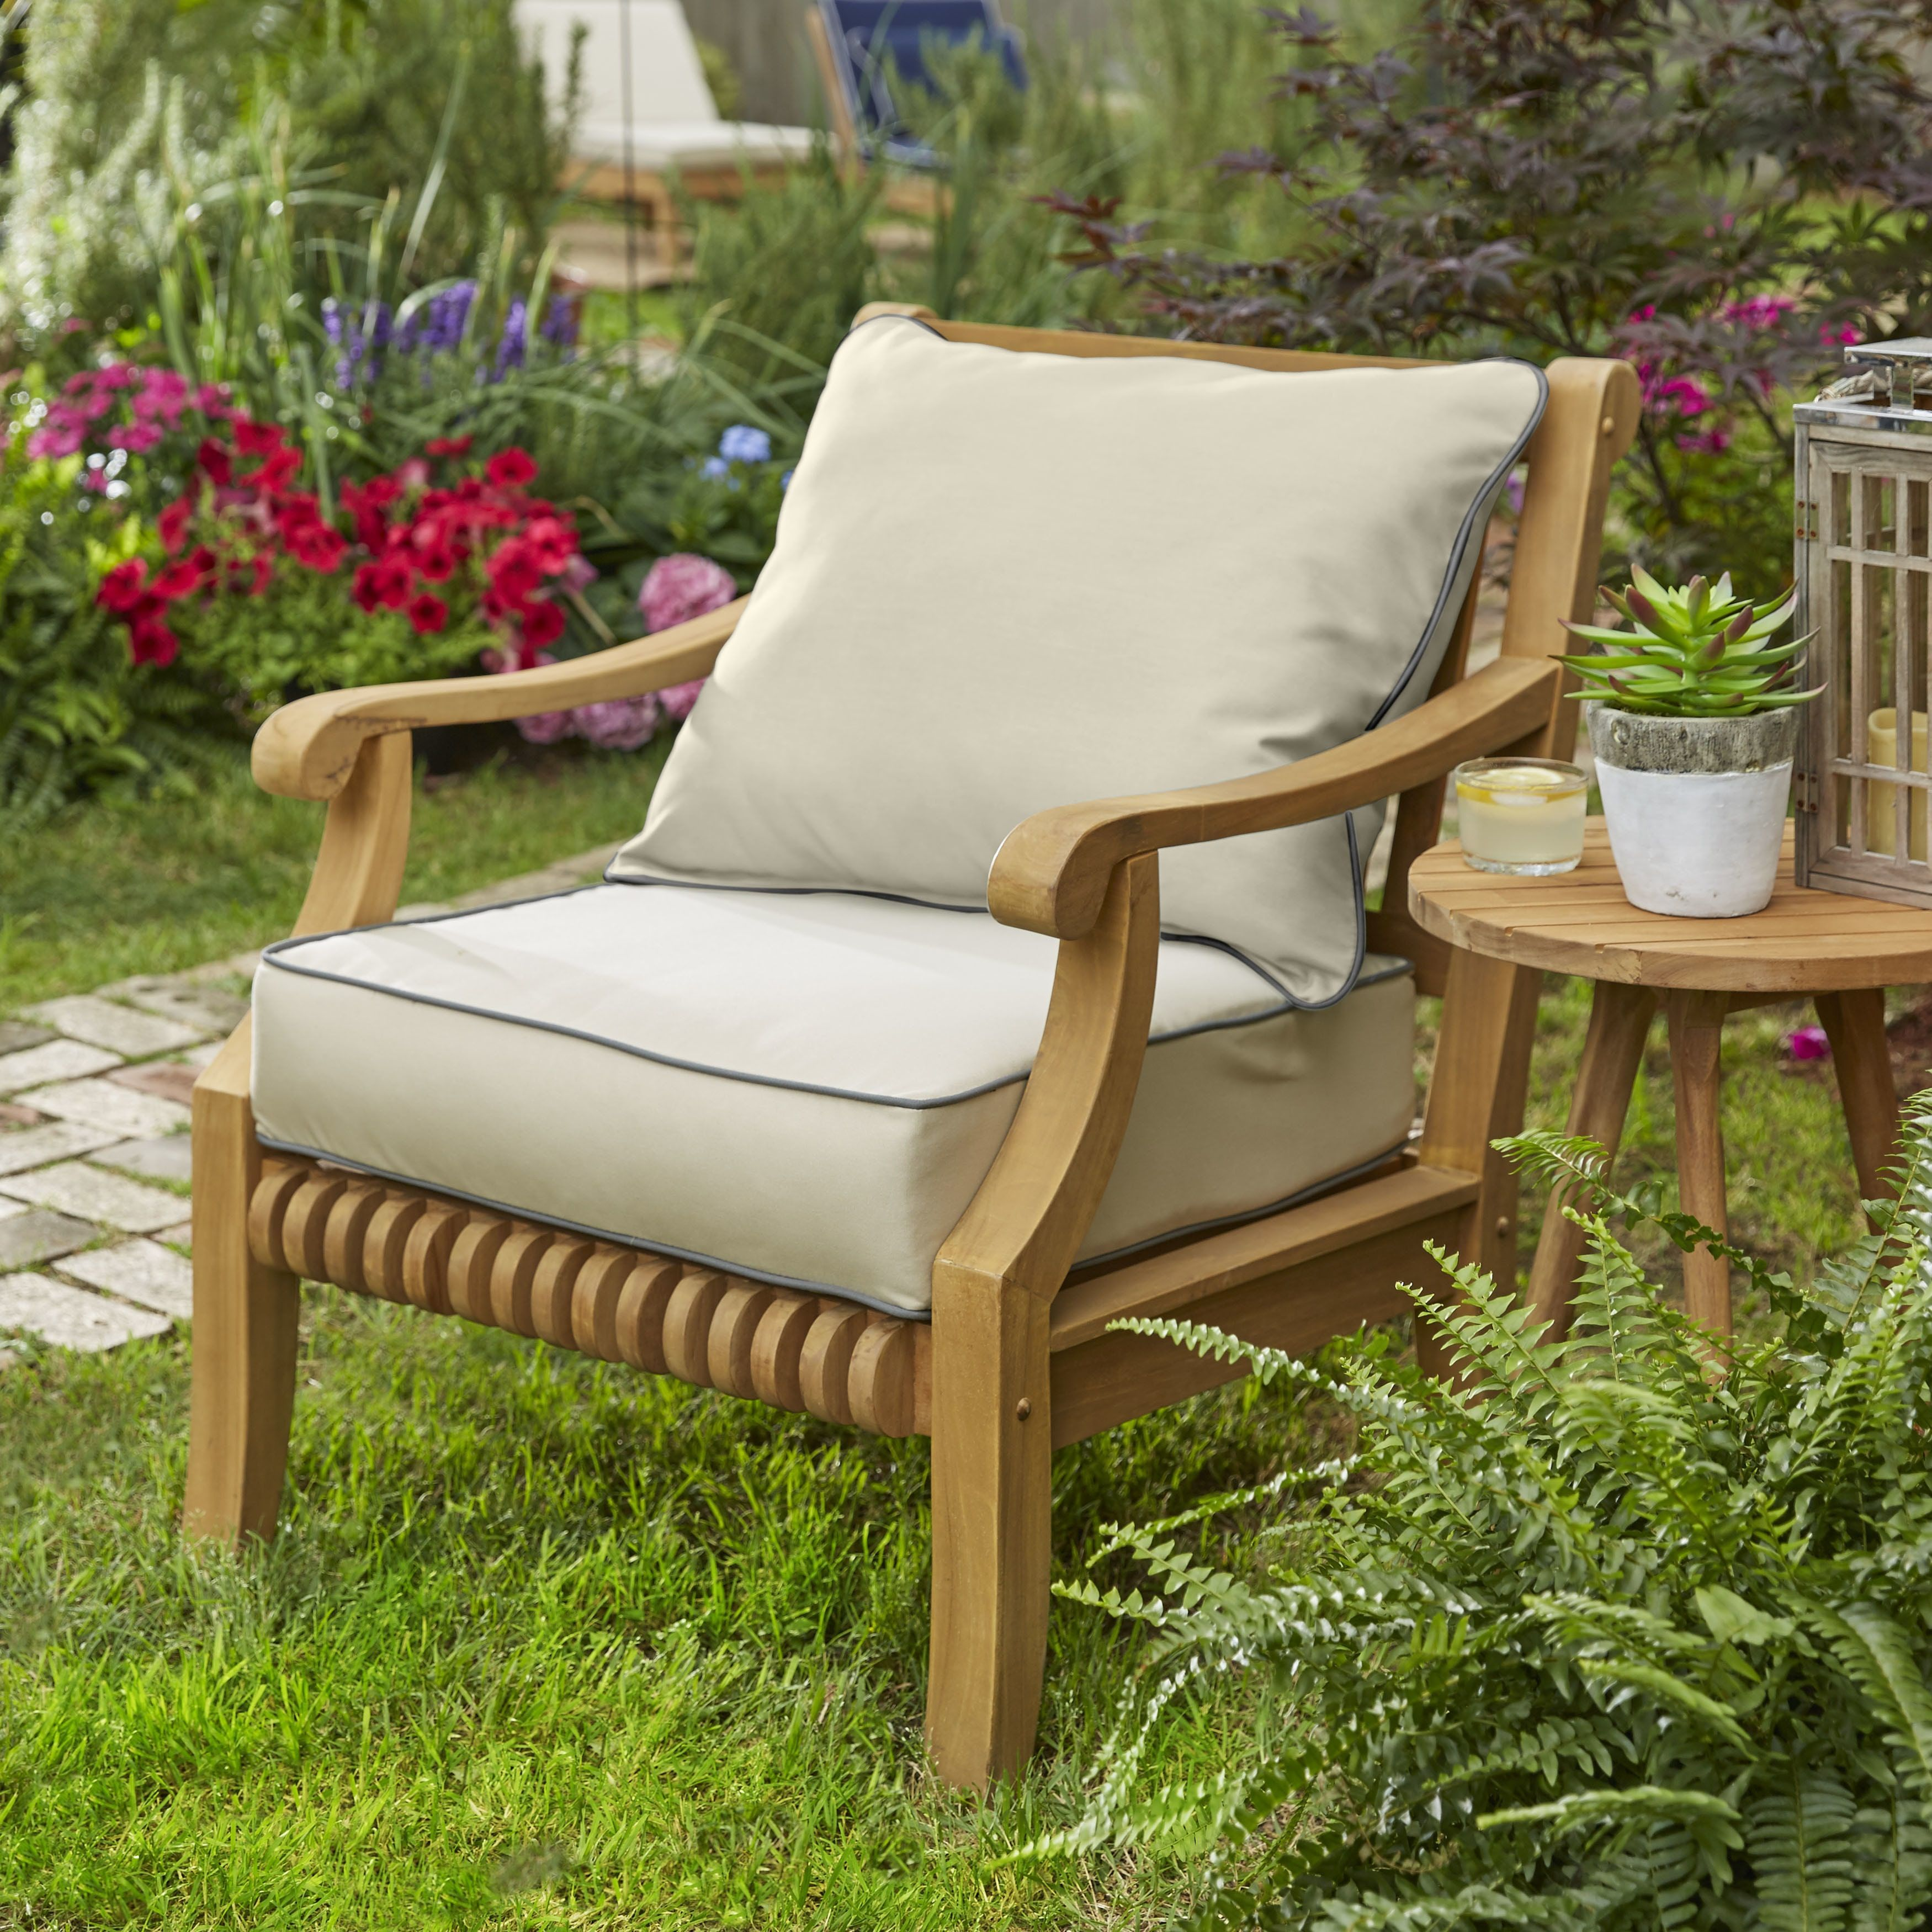 kokomo teak lounge chair pillow and cushion set with sunbrella